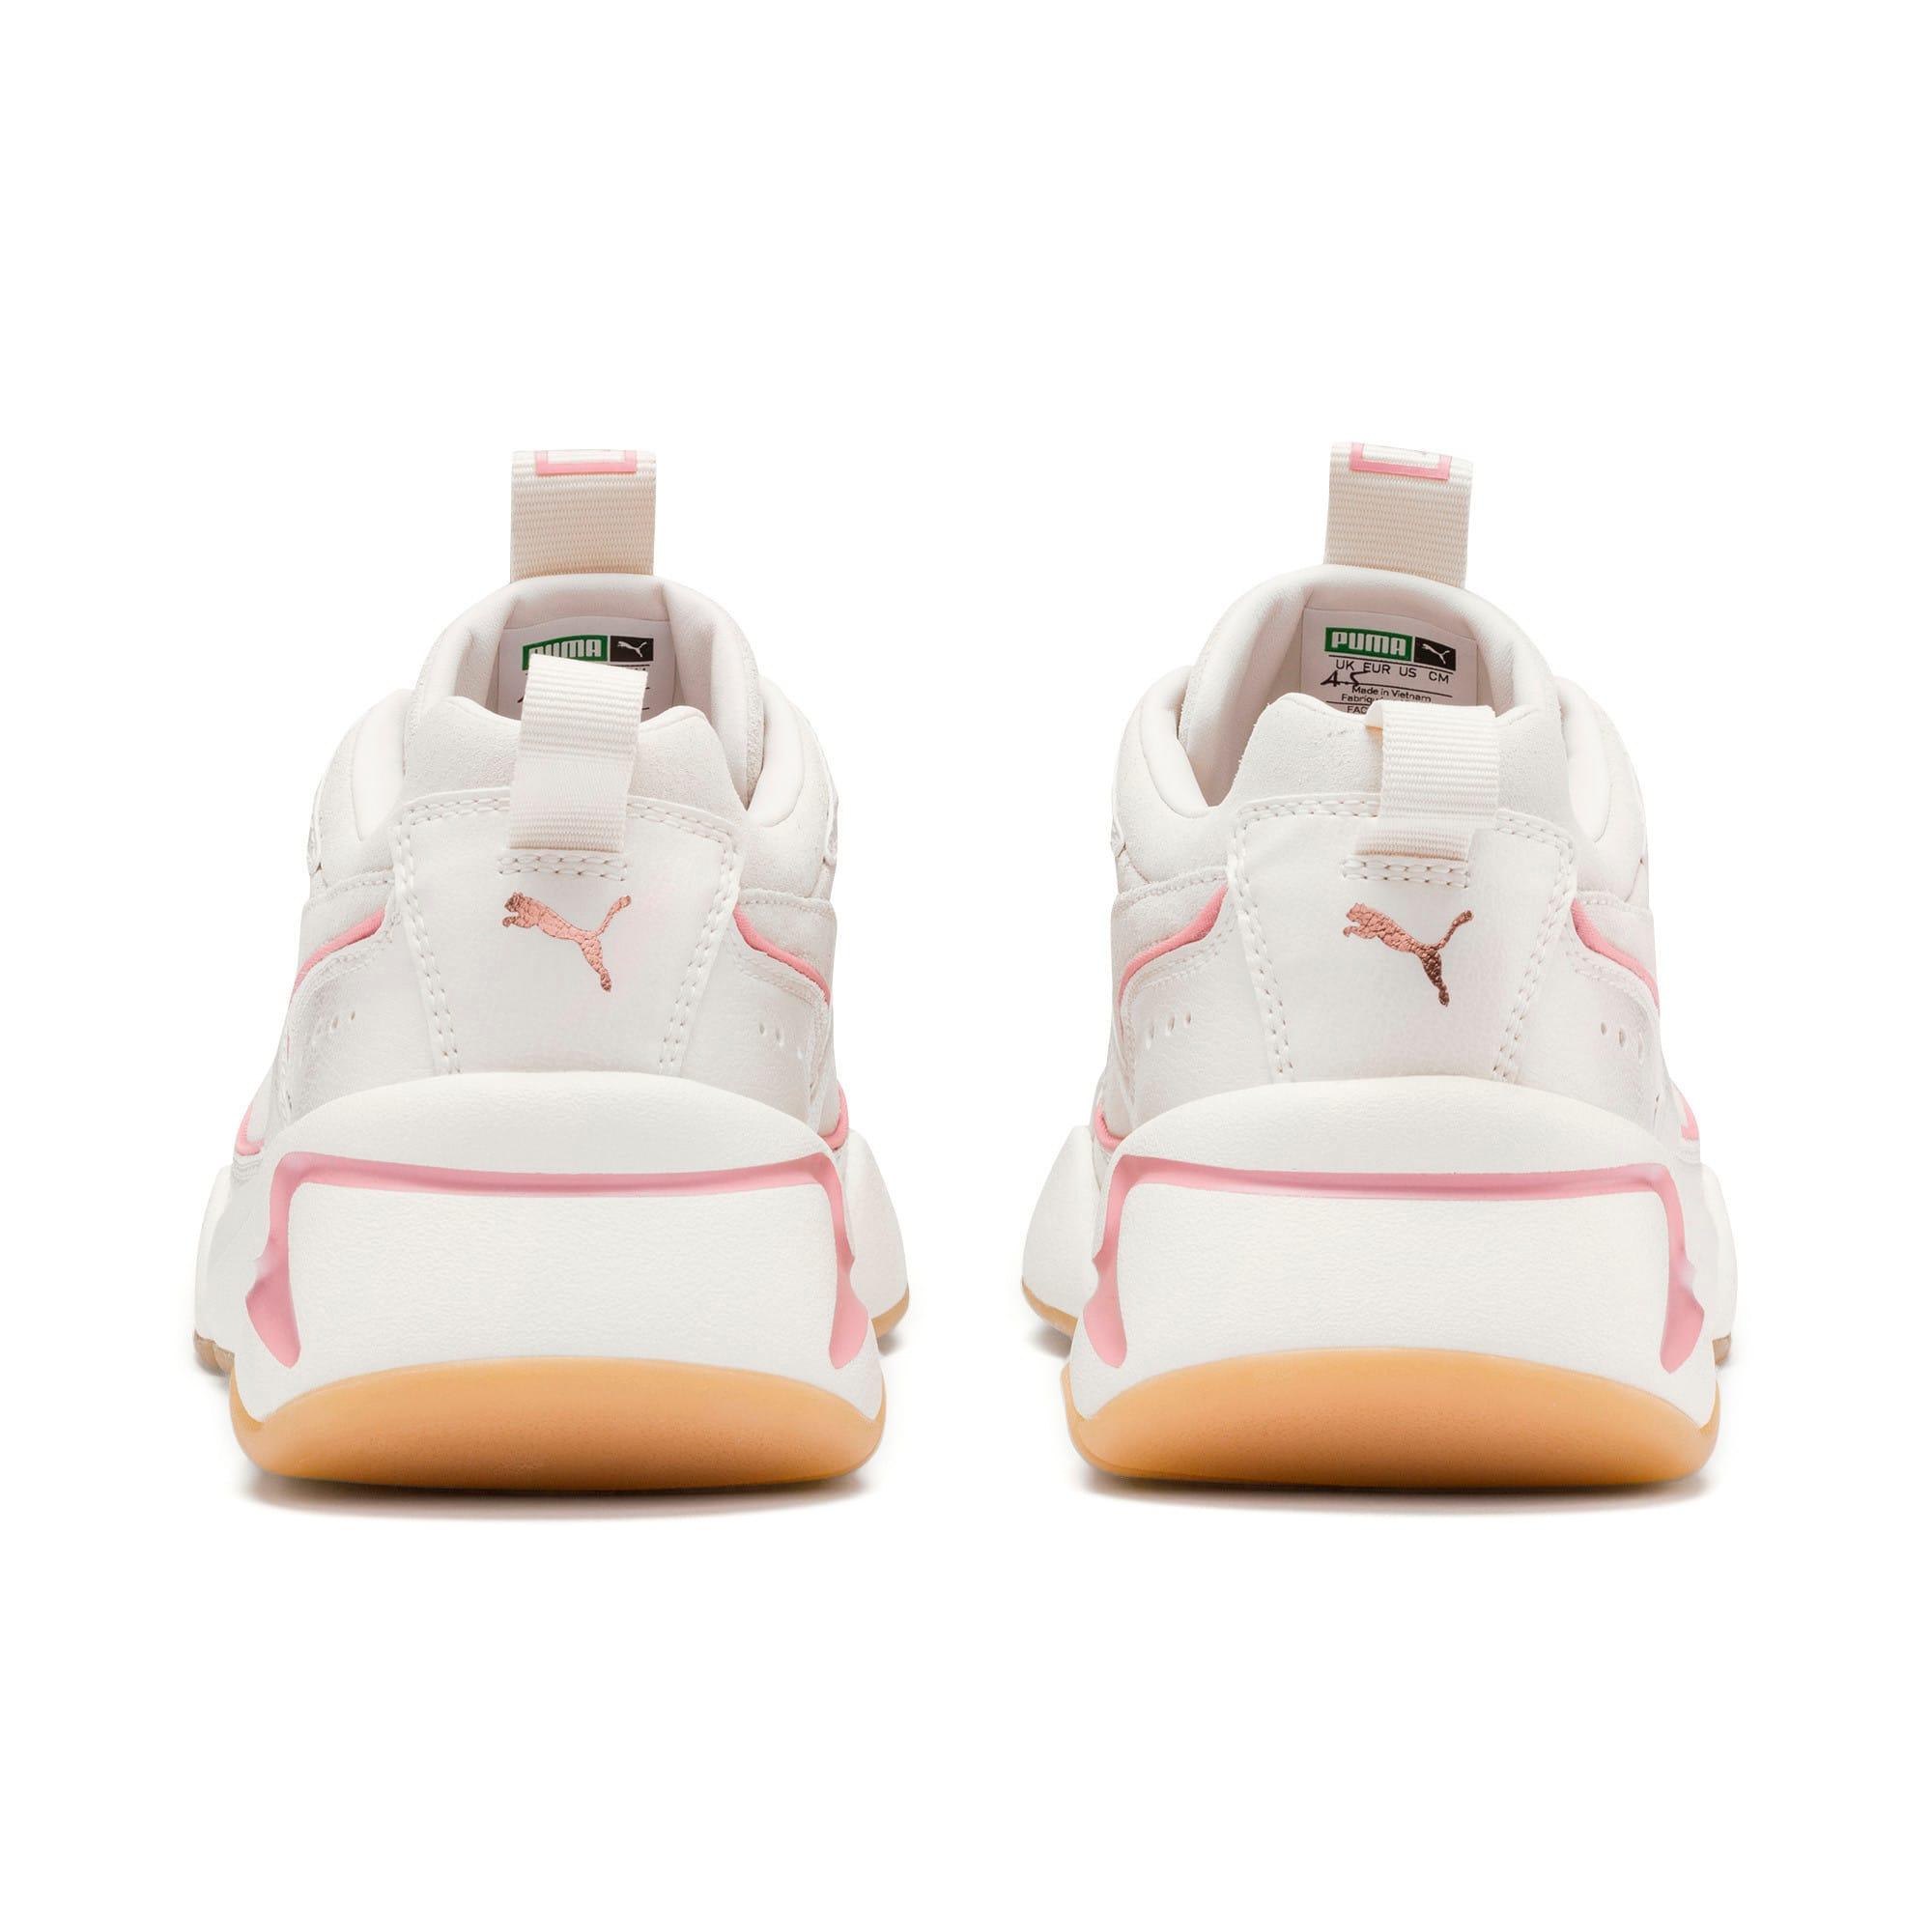 Thumbnail 4 of Nova 2 Suede Women's Sneakers, Pastel Parchment-Whisp White, medium